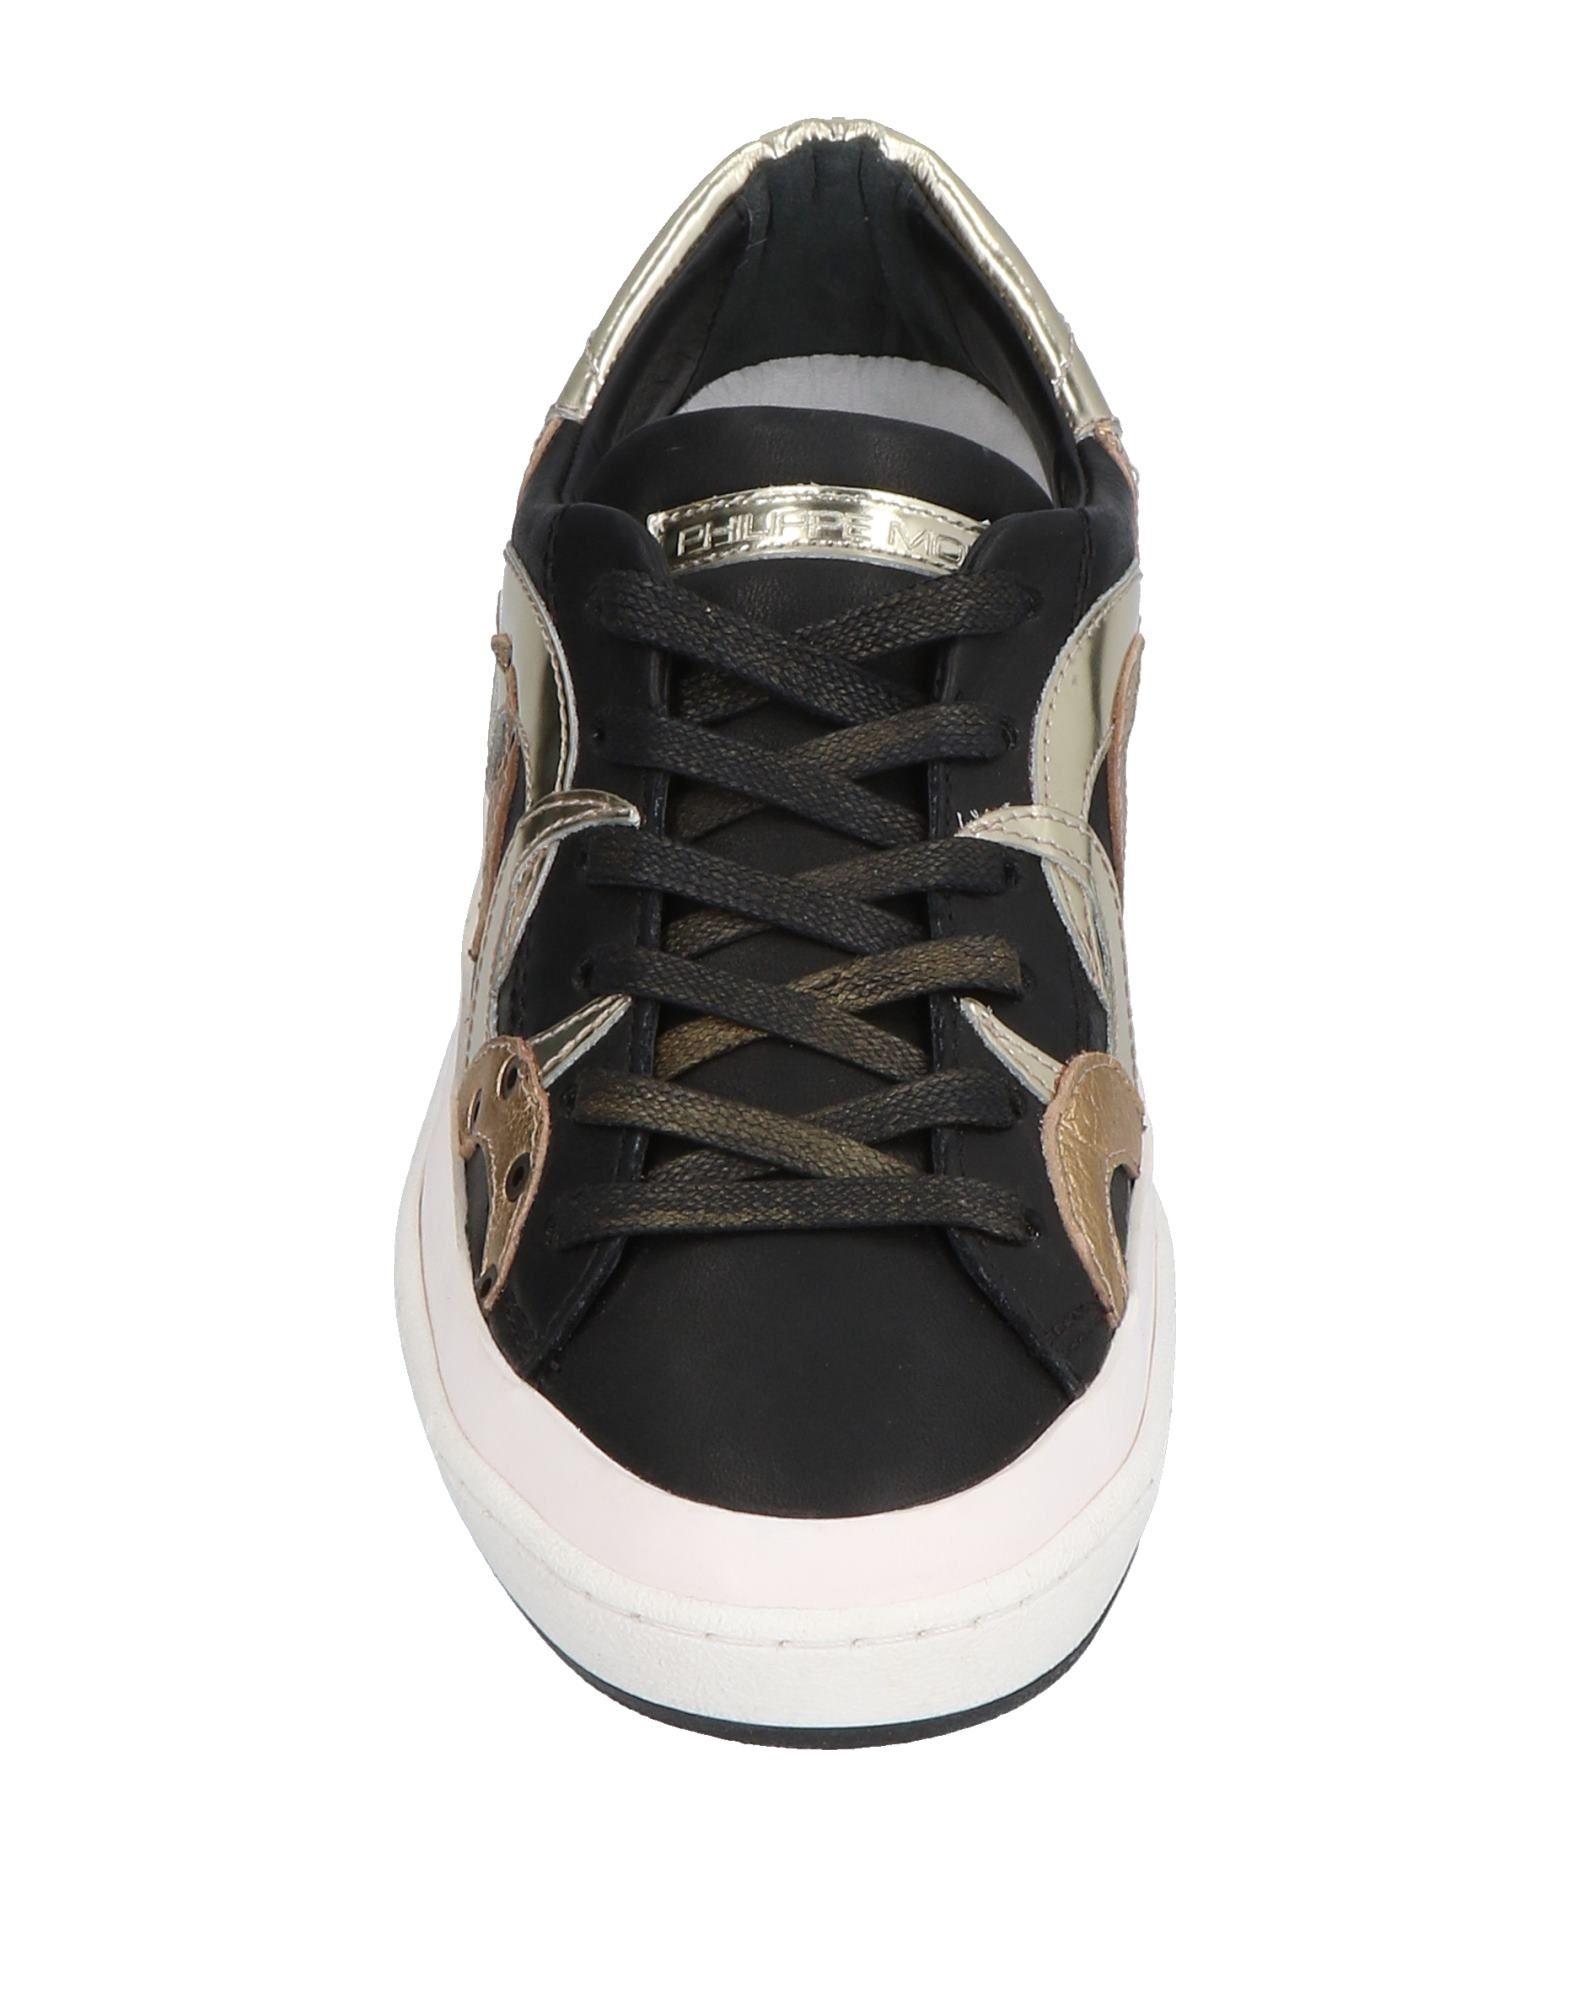 Stilvolle billige Schuhe Philippe Model Sneakers Damen Damen Damen  11478585MP 59226c